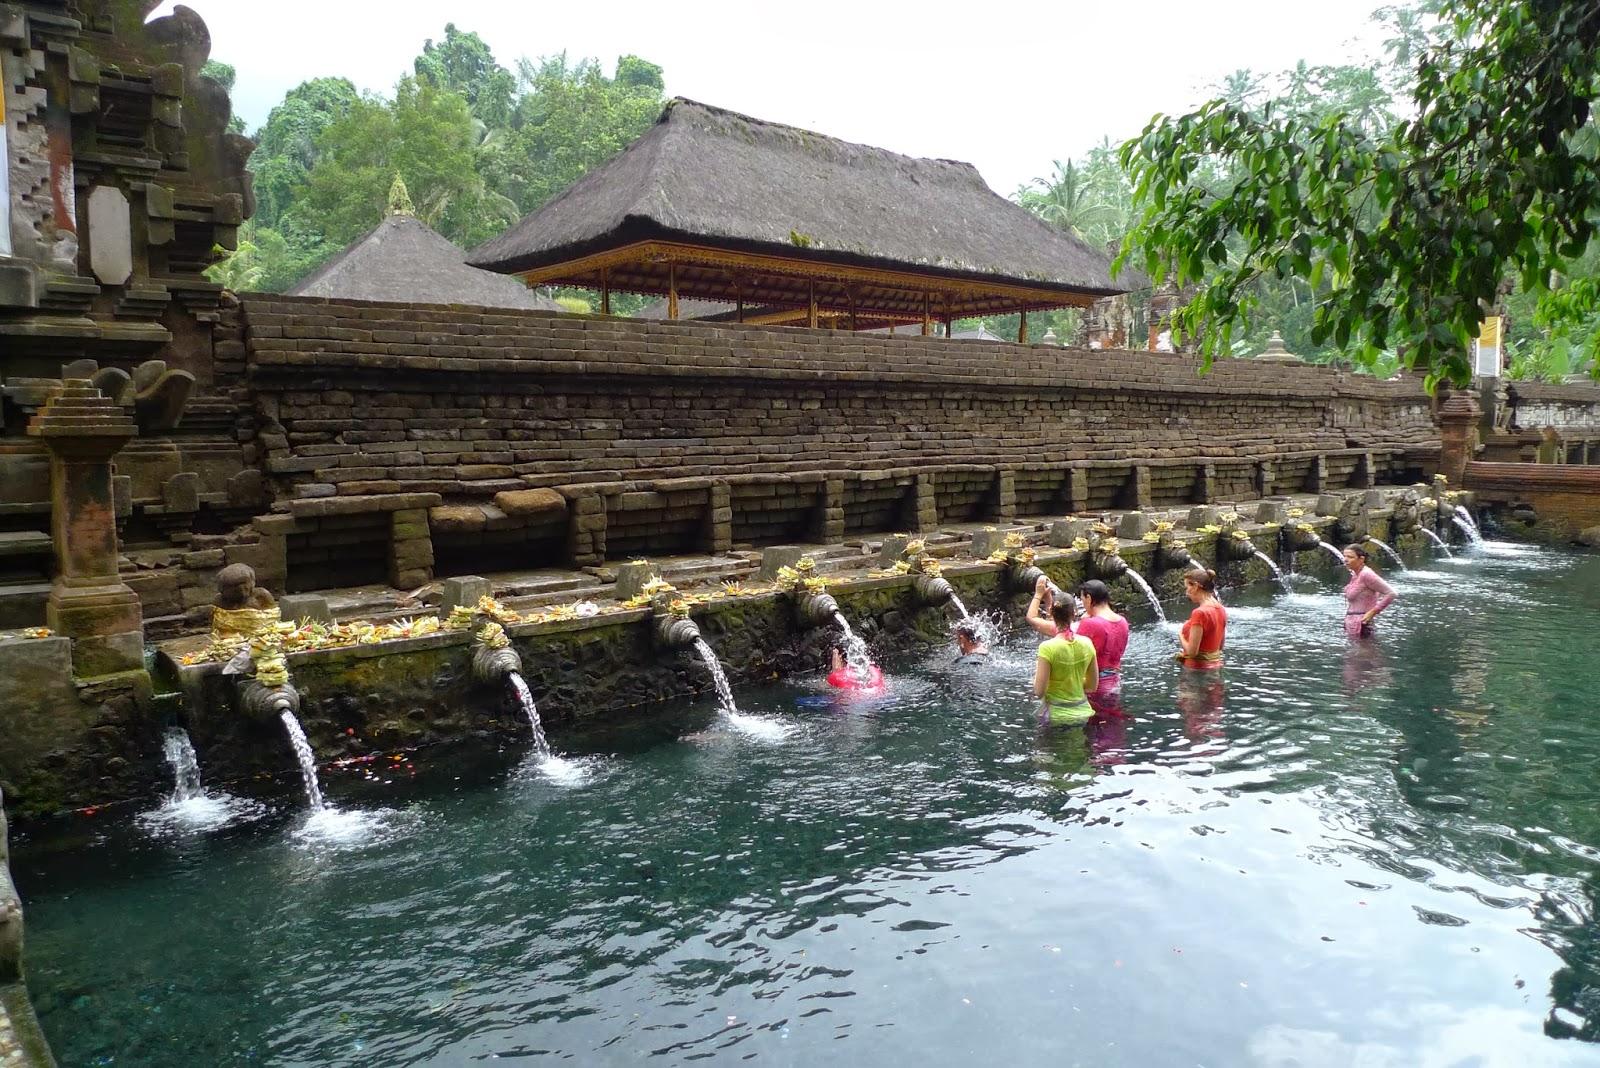 Tampak Siring Bali - Tirta Empul Temple